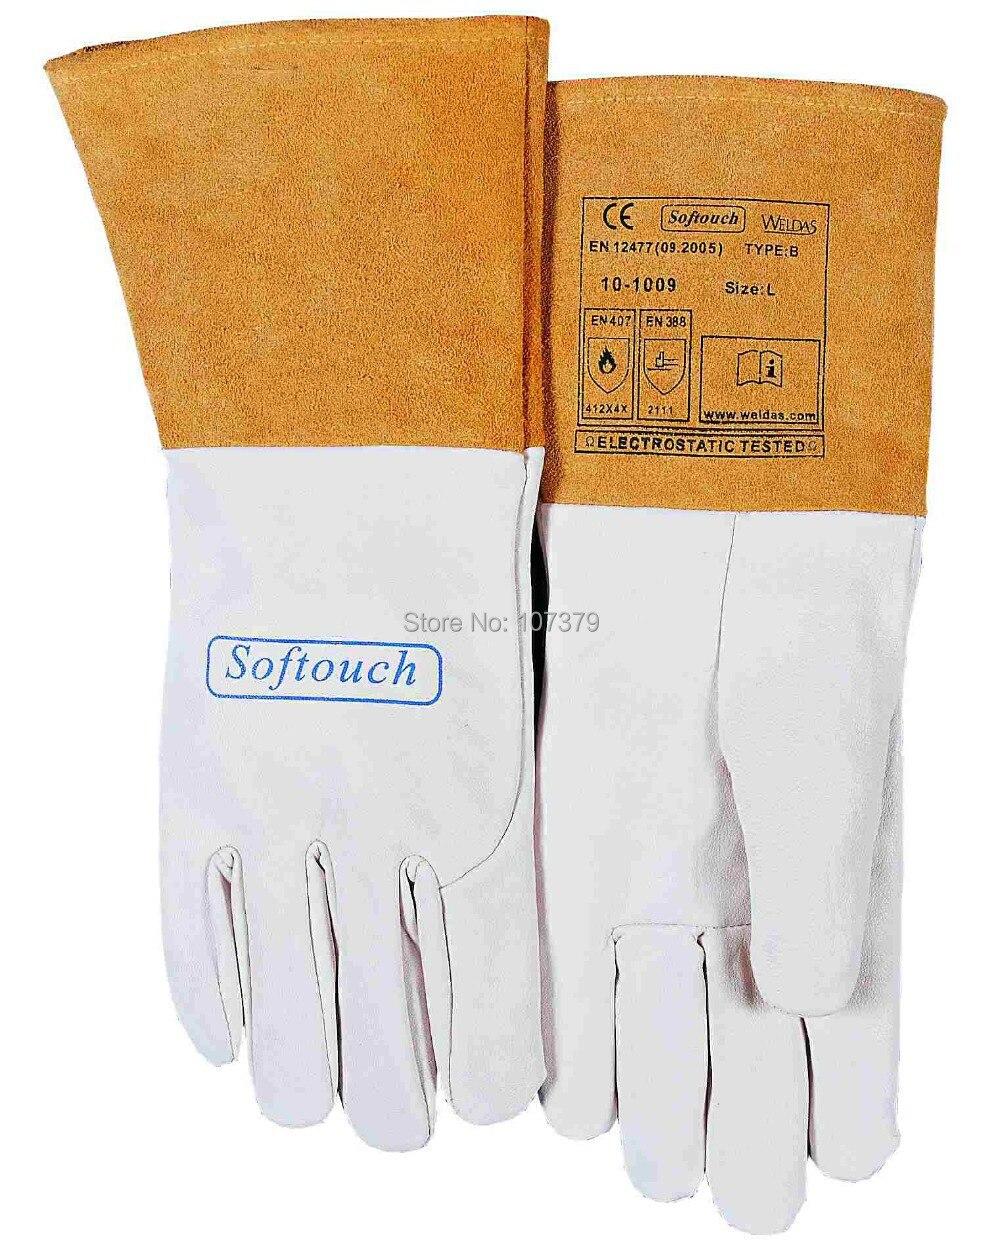 TIG MIG Work Glove Grain Goat Leather Welding Safety Glove mig mag burner gas burner gas linternas wp 17 sr 17 tig welding torch complete 17feet 5meter soldering iron air cooled 150amp